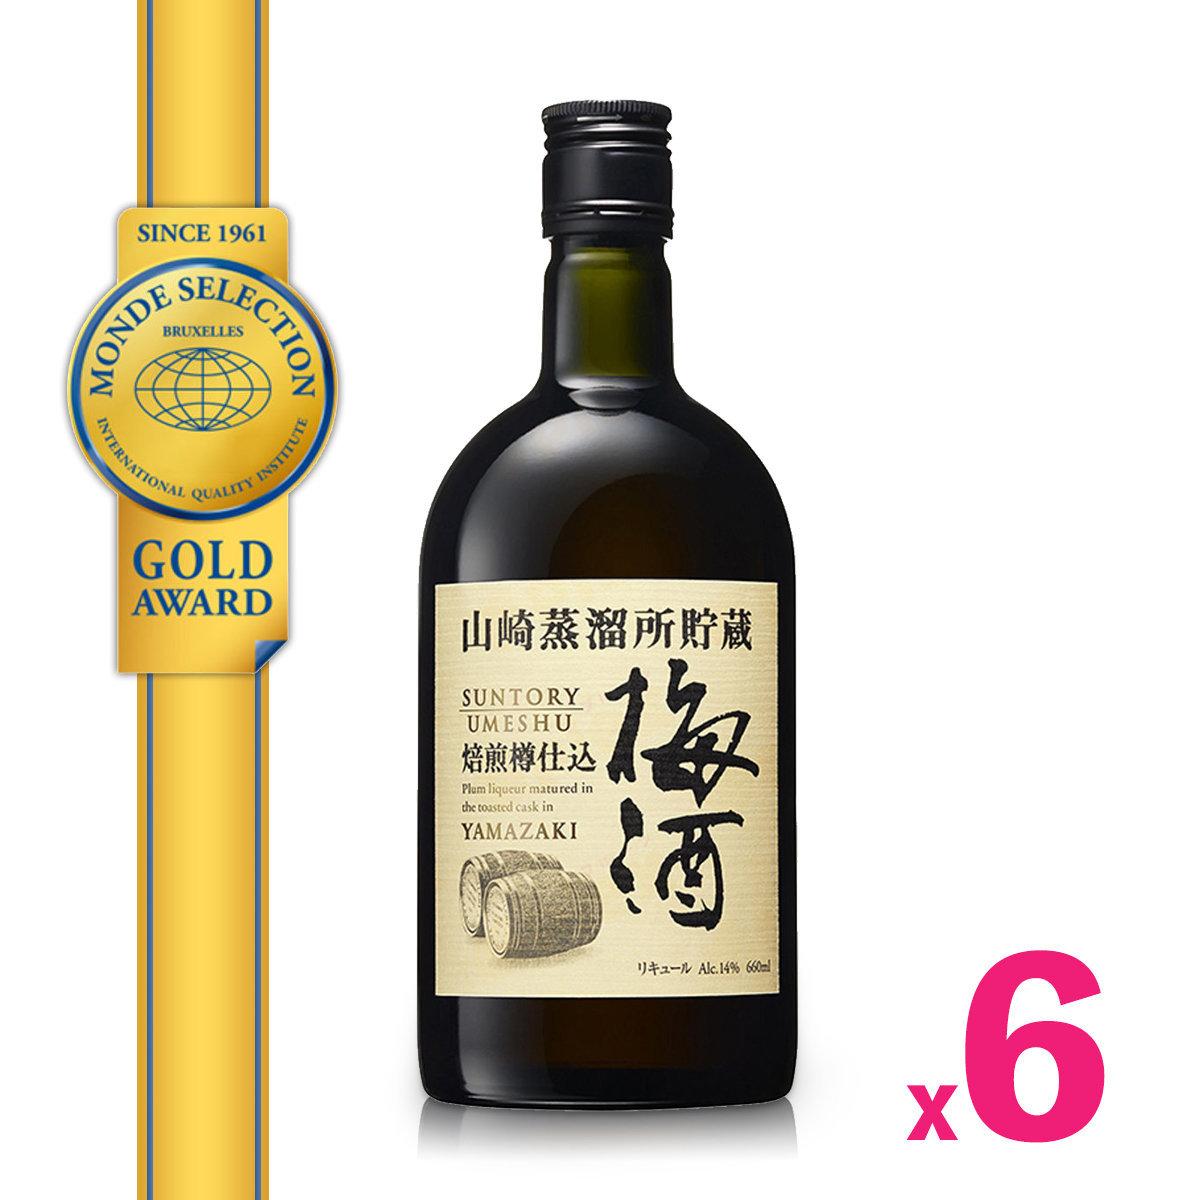 Yamazaki Distillery Reserve Suntory Umeshu 660ml x 6bottles